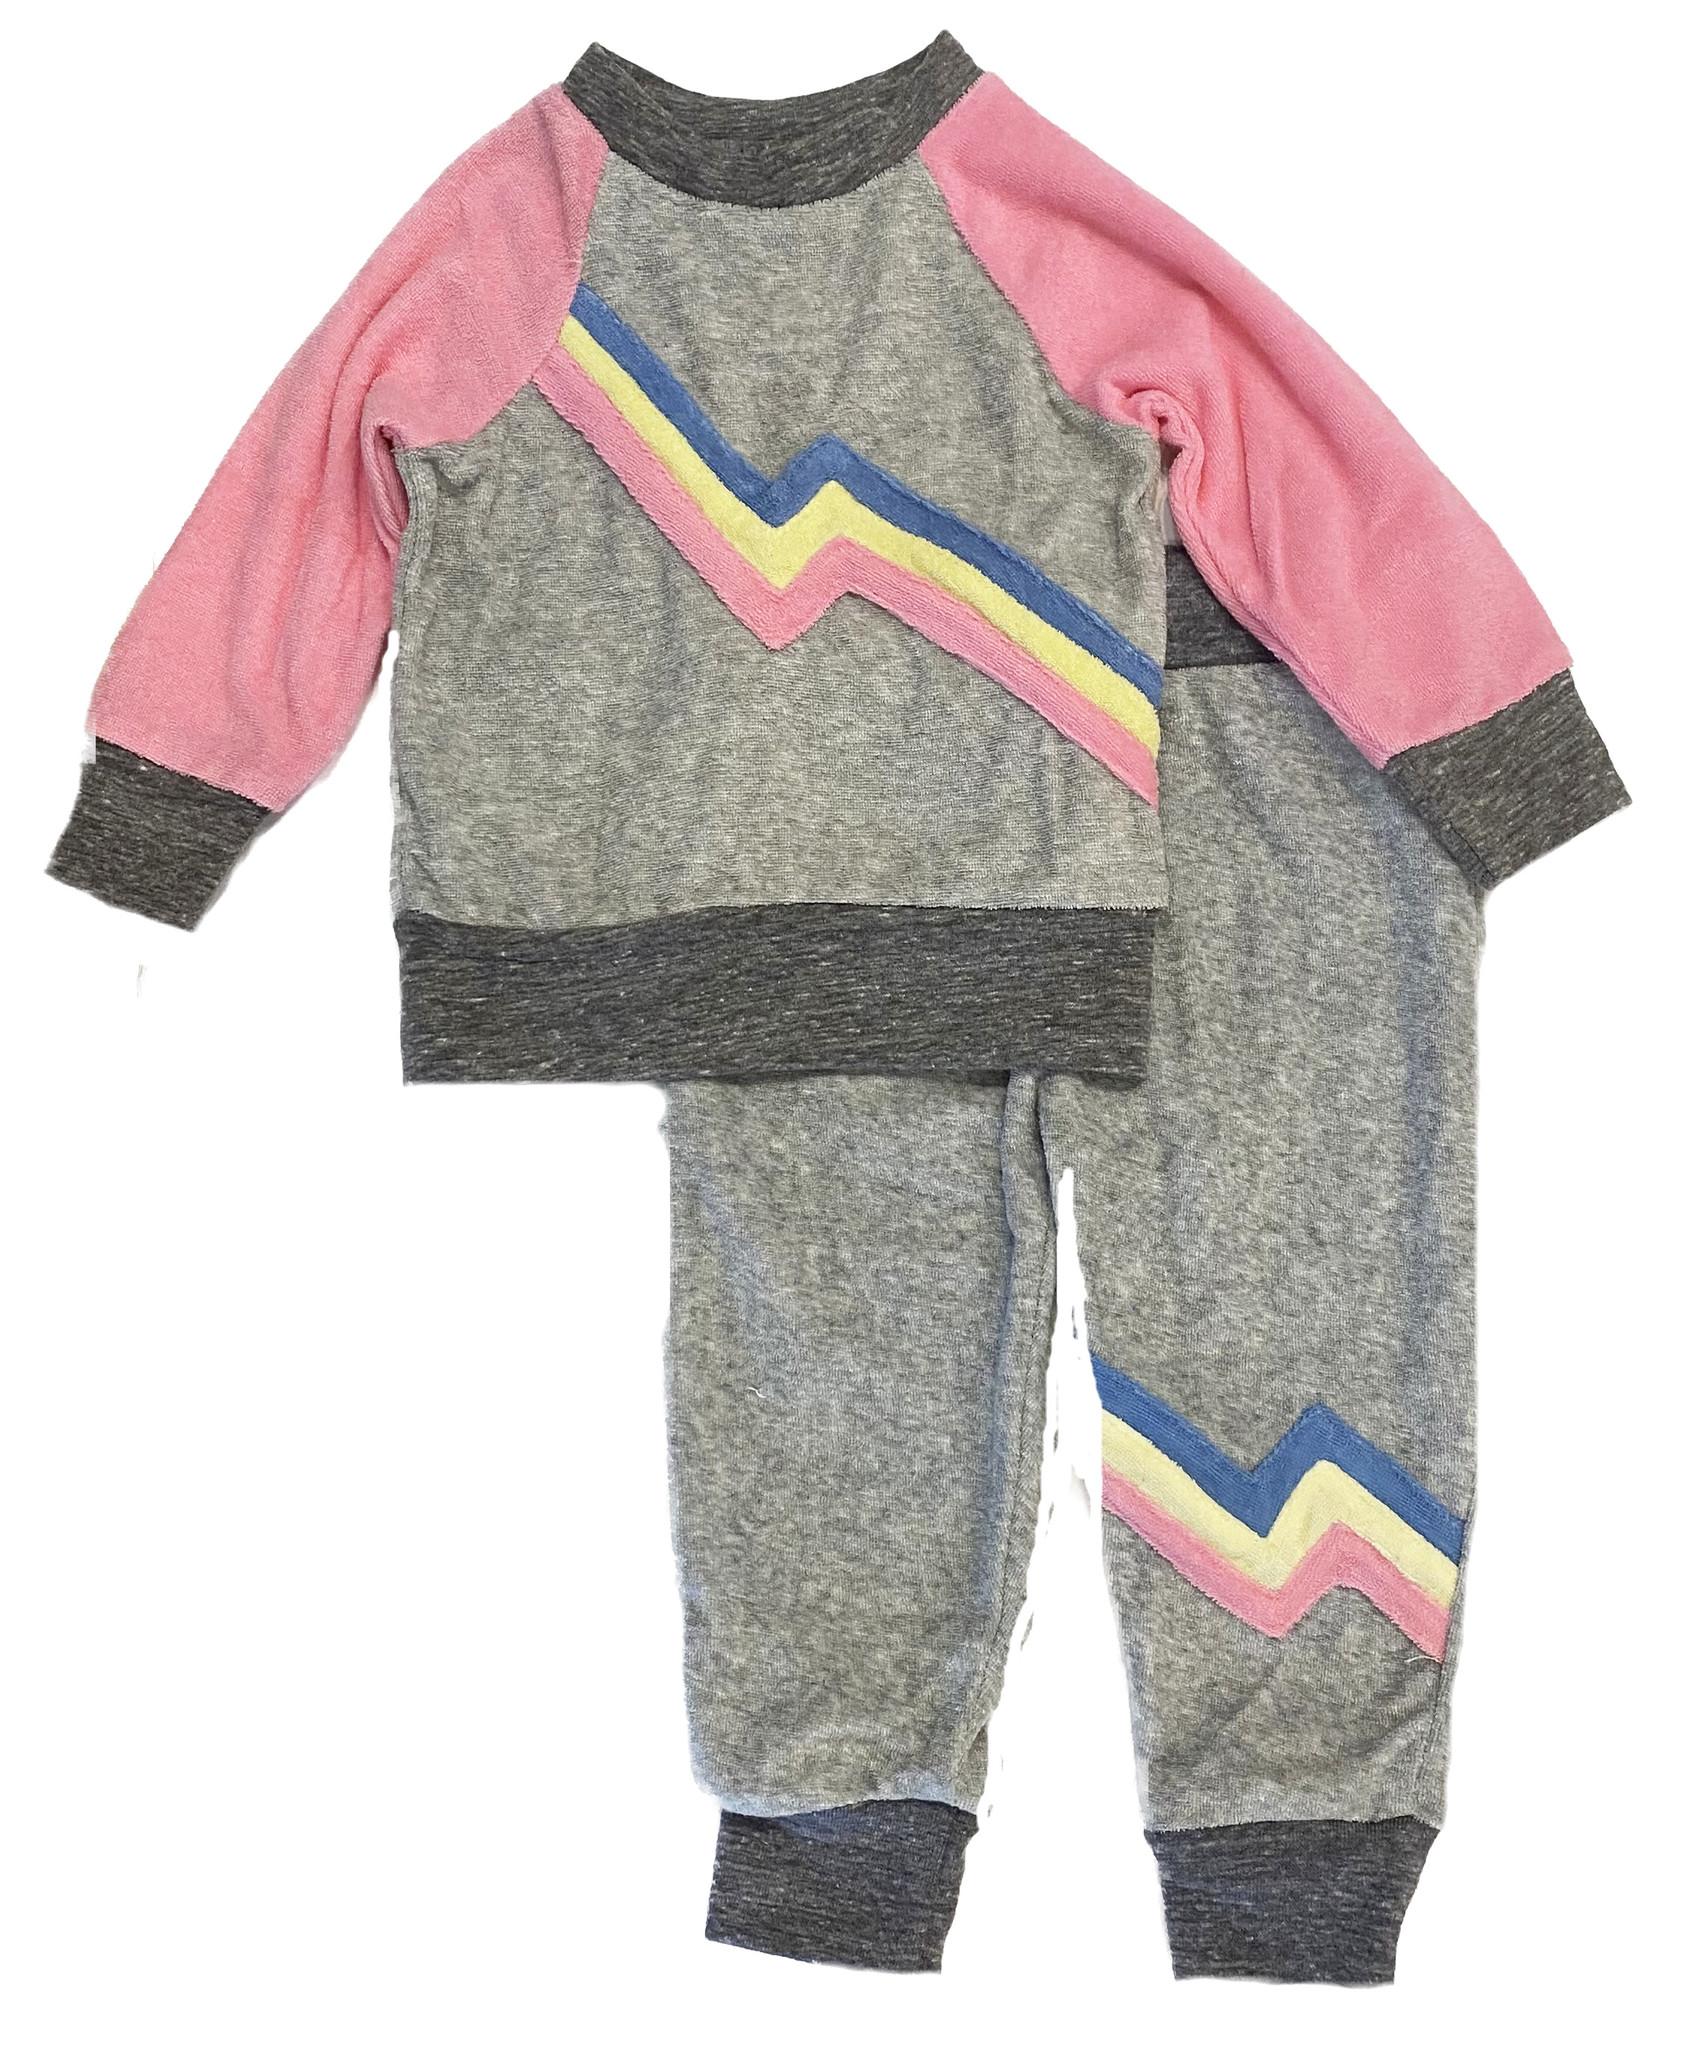 Miki Miette Pink Zeppelin Infant Set